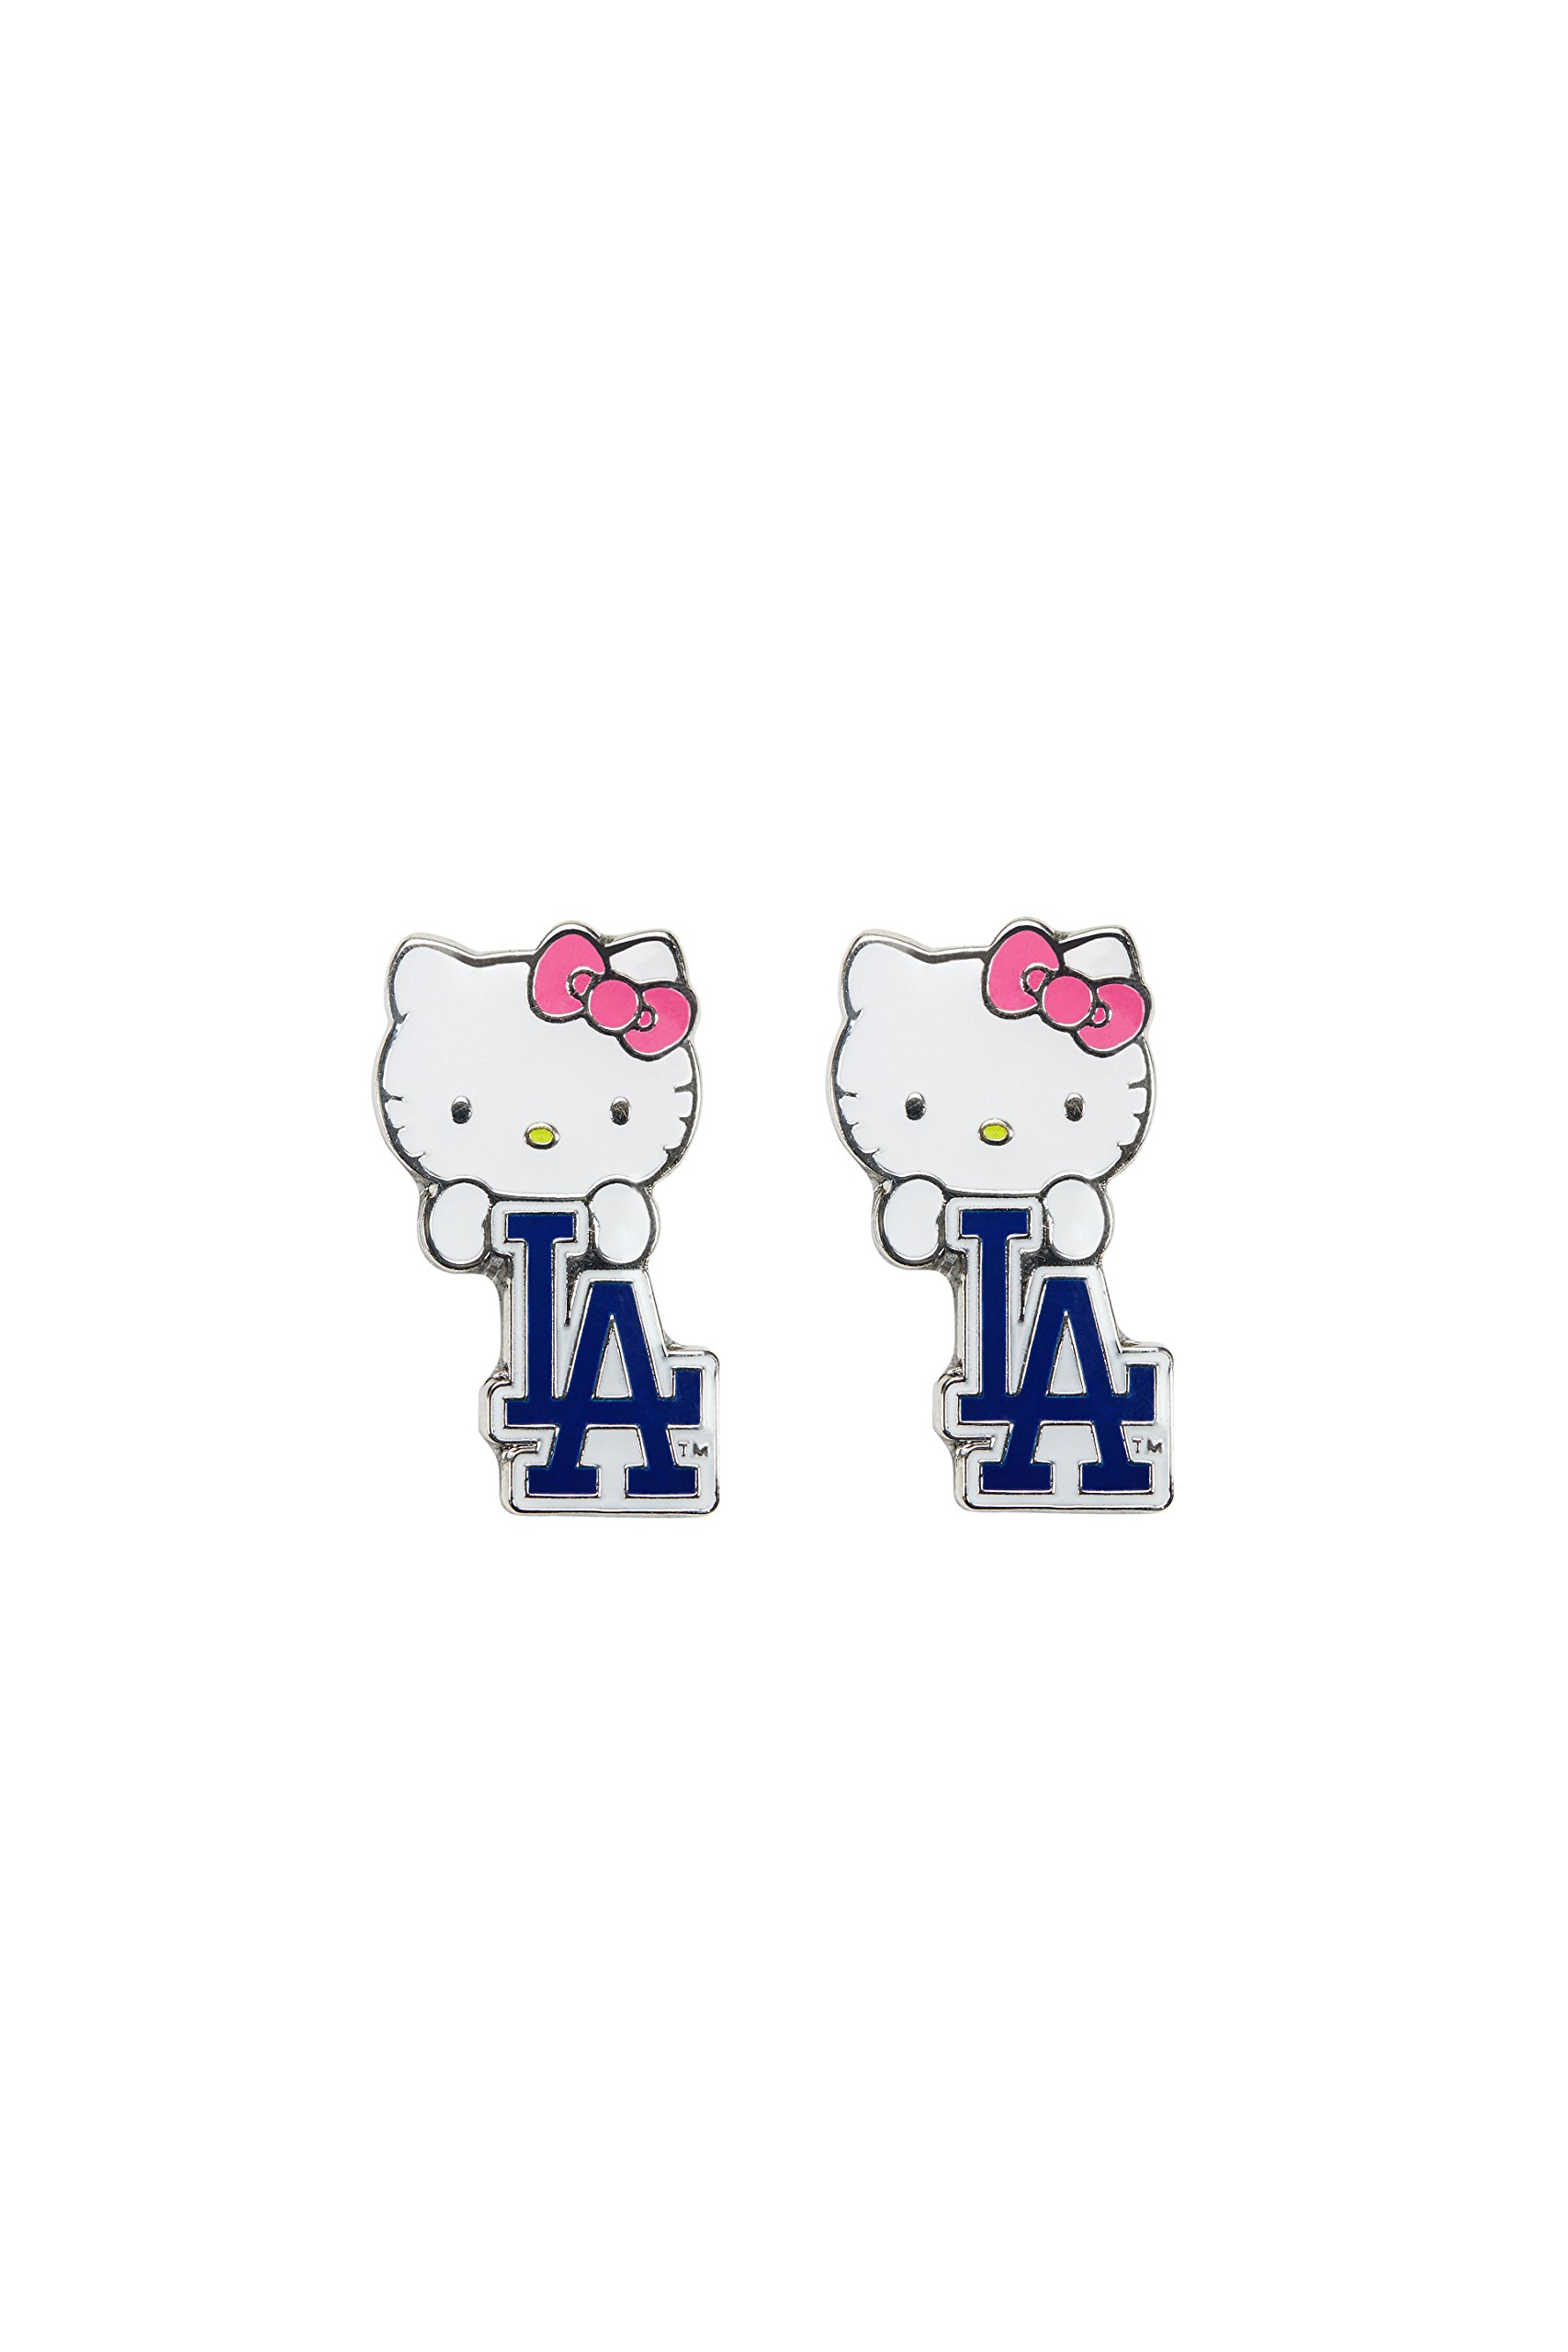 a8e6dbf80 Buy MLB Detroit Tigers Hello Kitty Sophie Beaded Earrings in Cheap ...